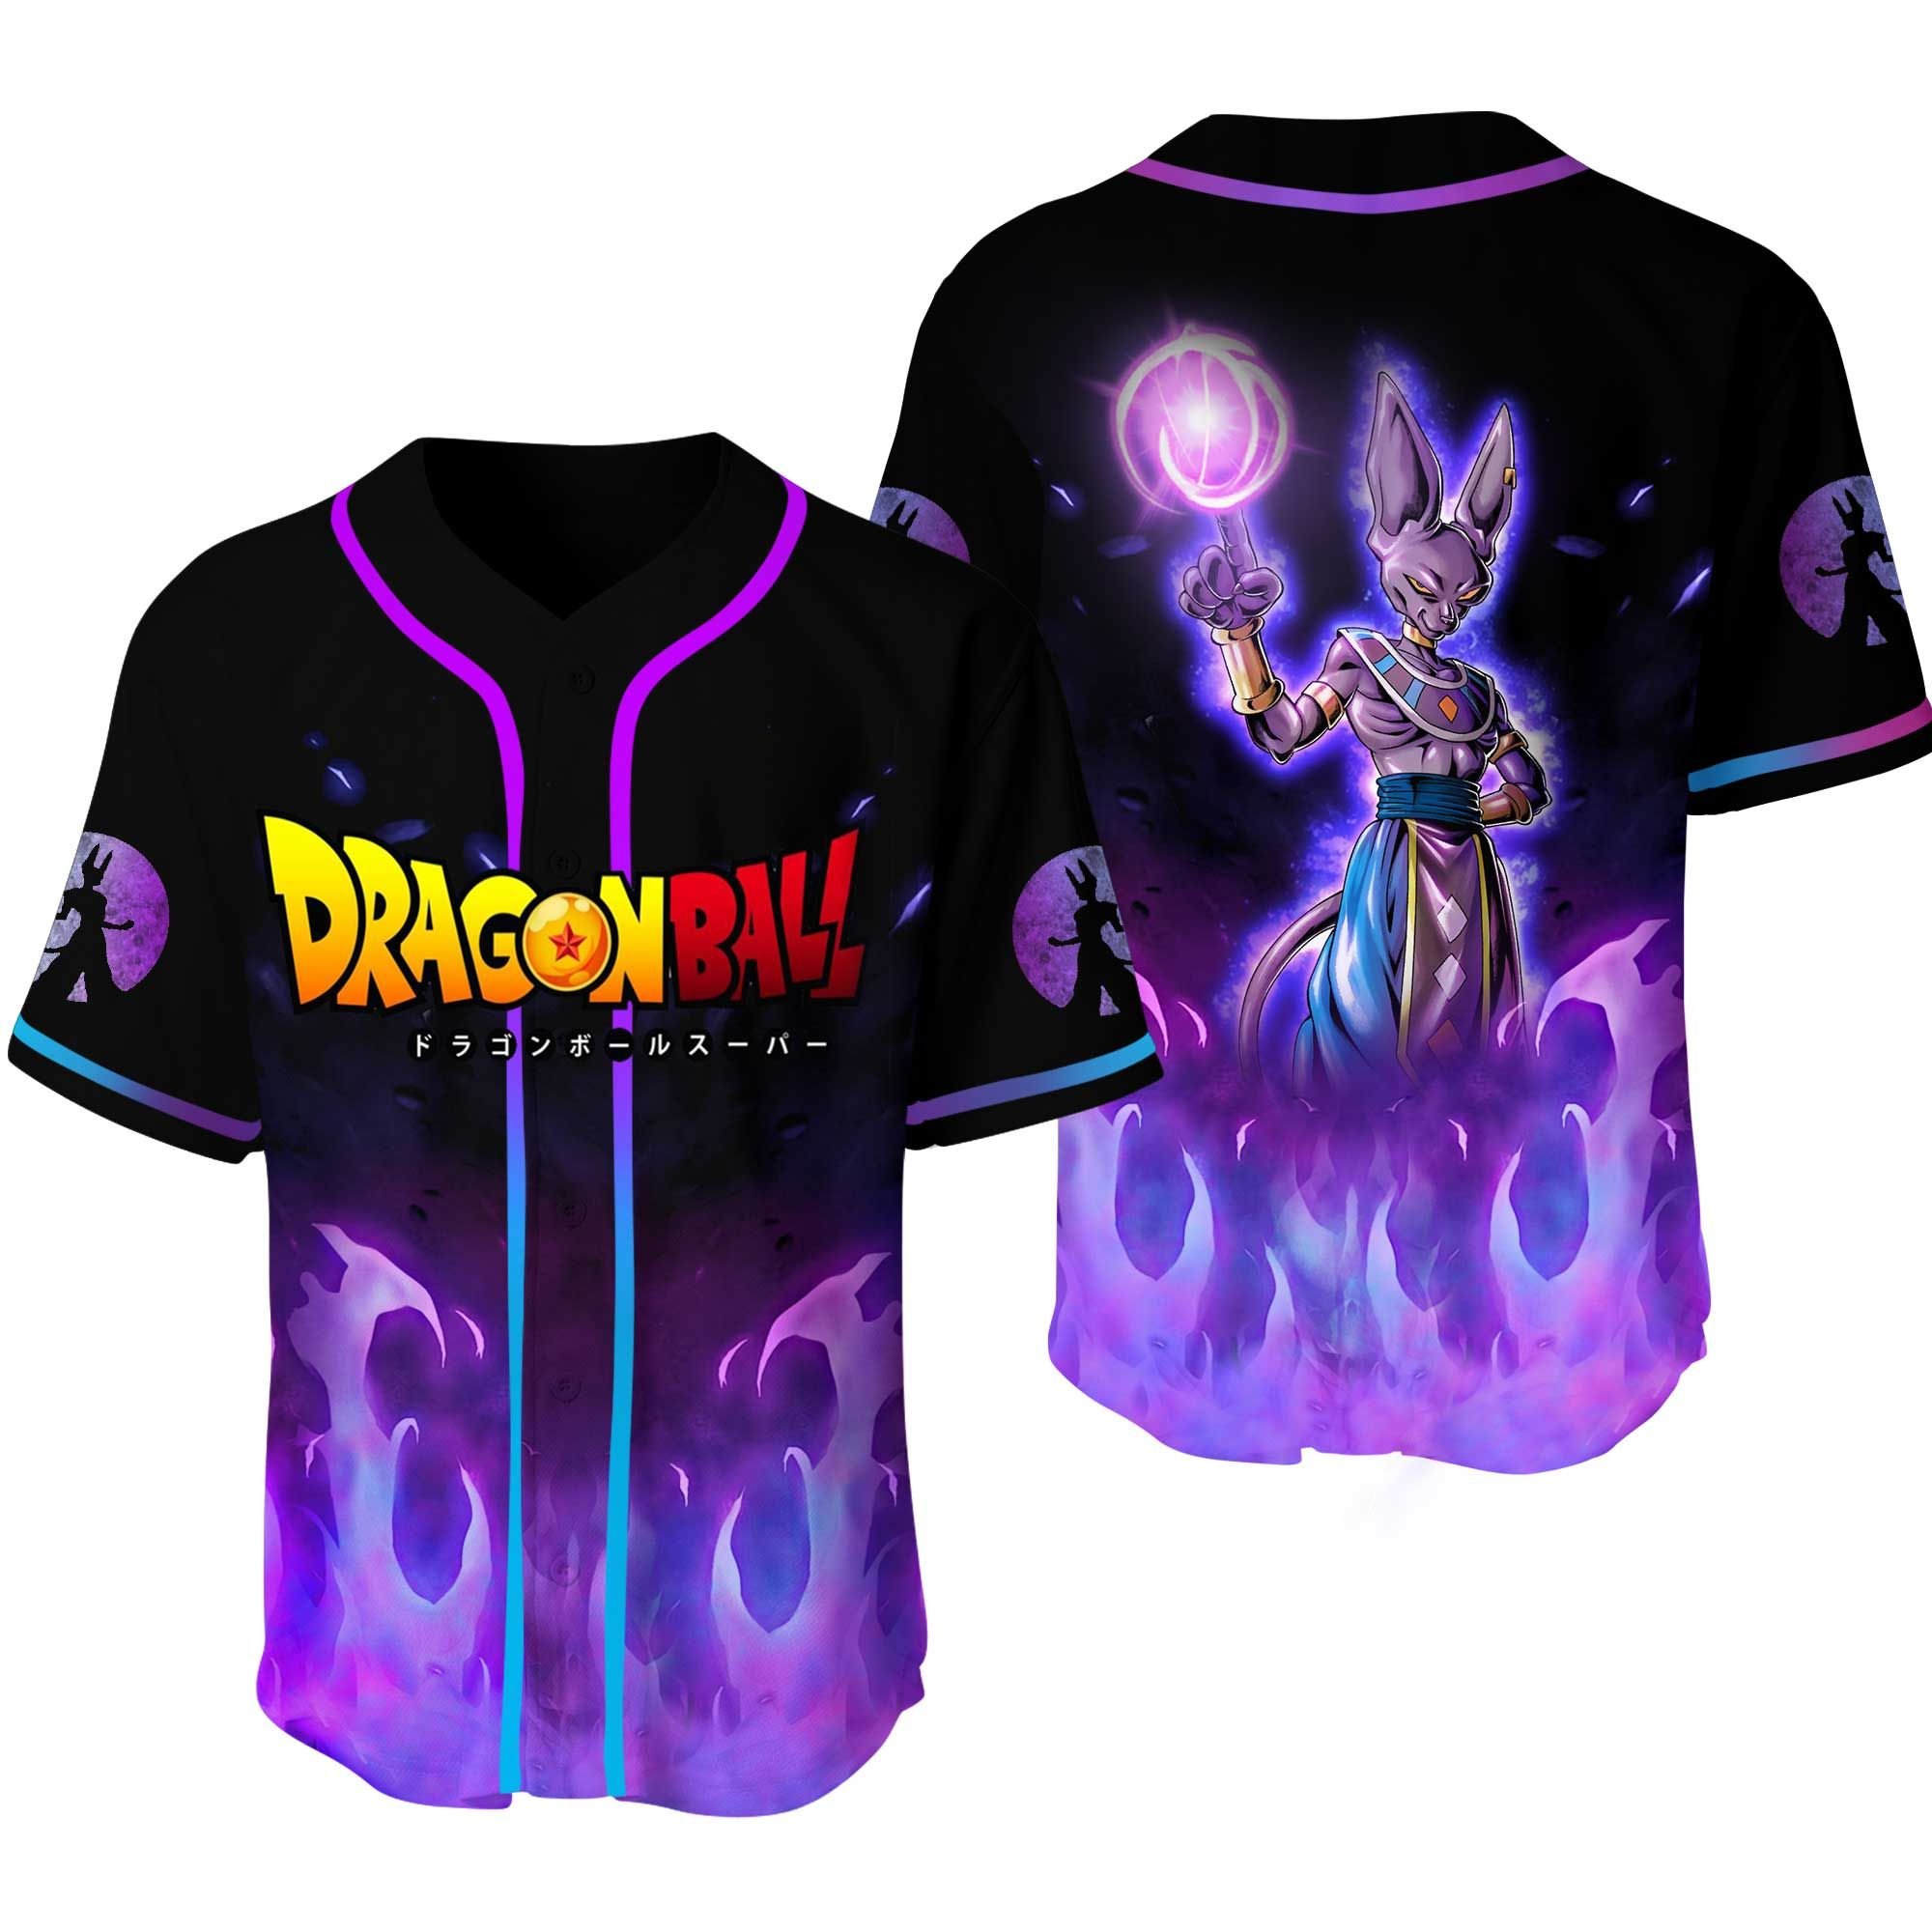 Dragon Ball Beerus Baseball Jersey Shirt